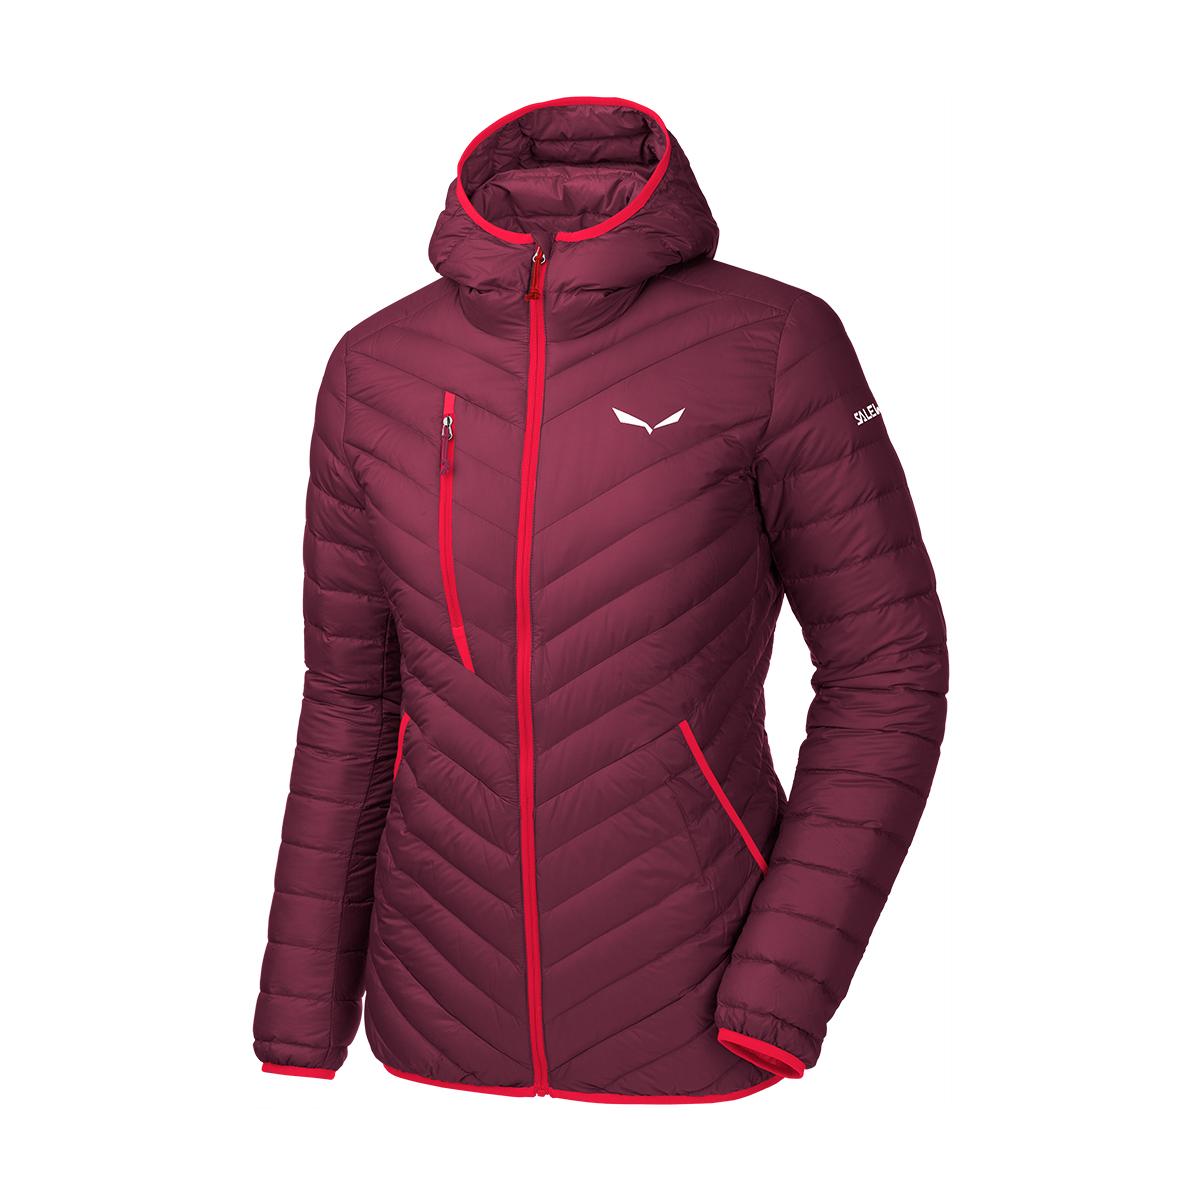 Light jackets for women